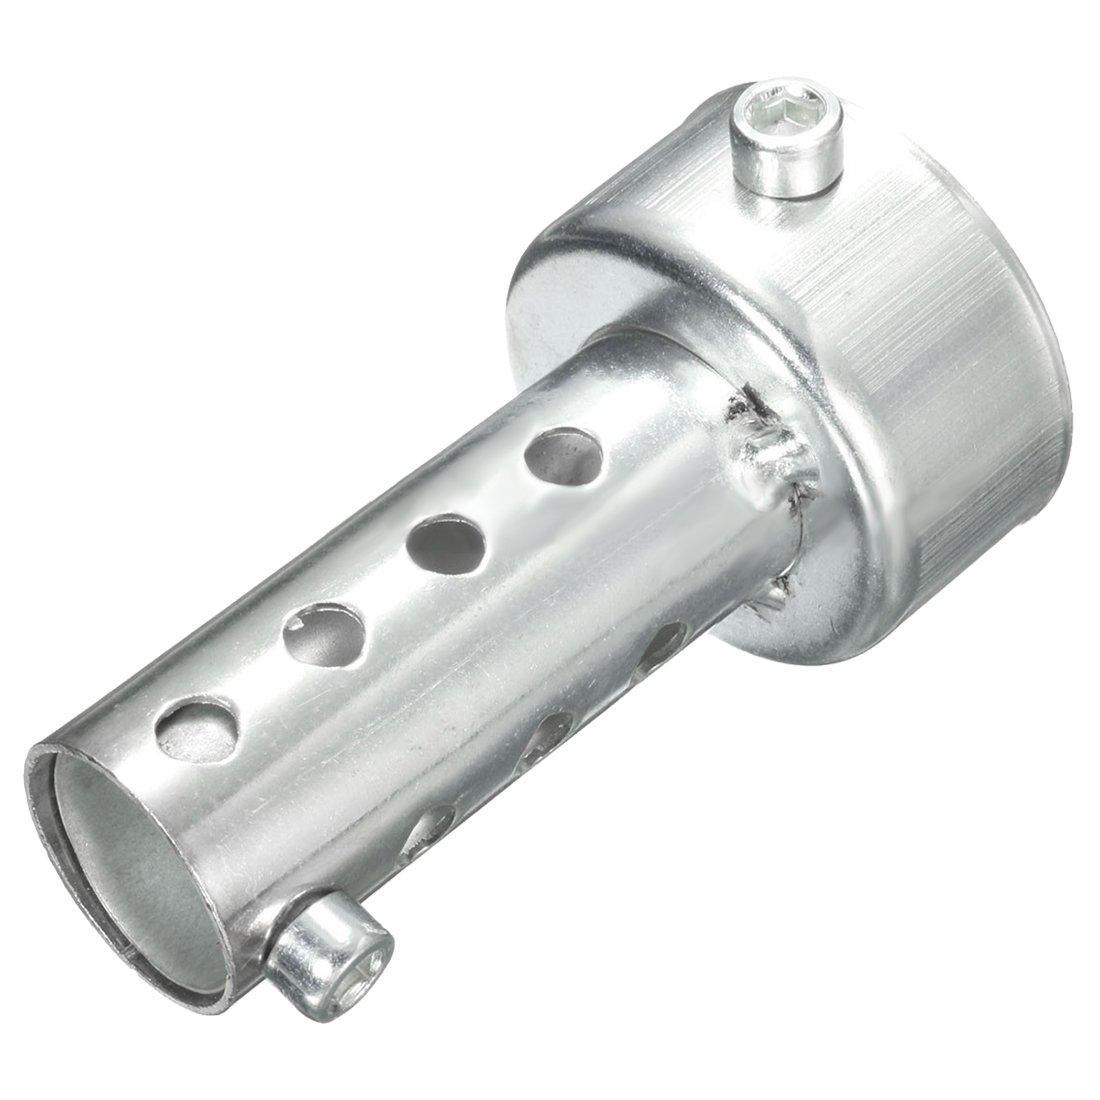 Cikuso Silver Motorcycle Exhaust Can Muffler Insert Baffle DB Killer Silencer 48mm x 140mm